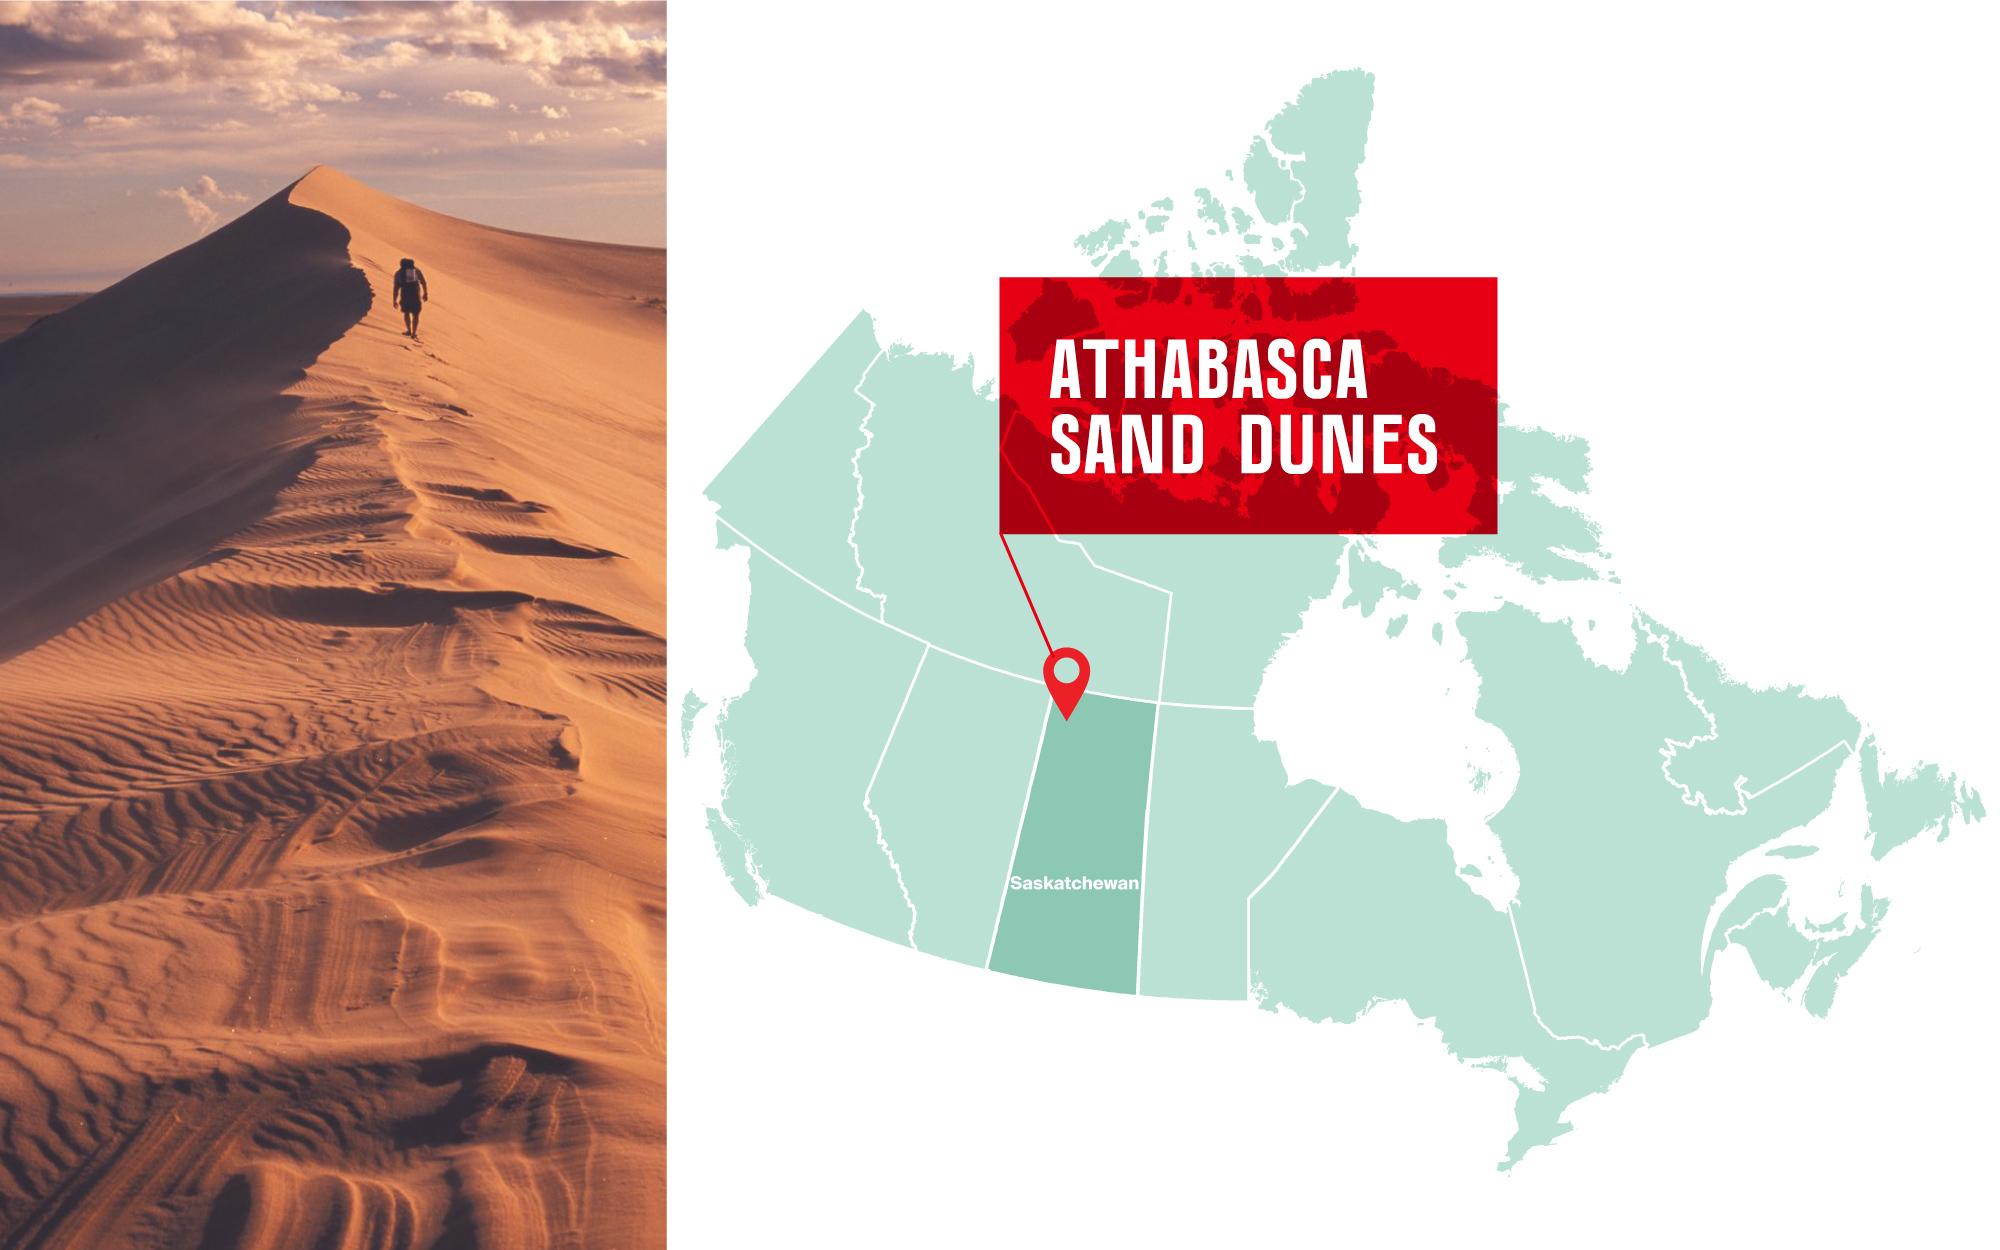 Photo credit: Tourism Saskatchewan